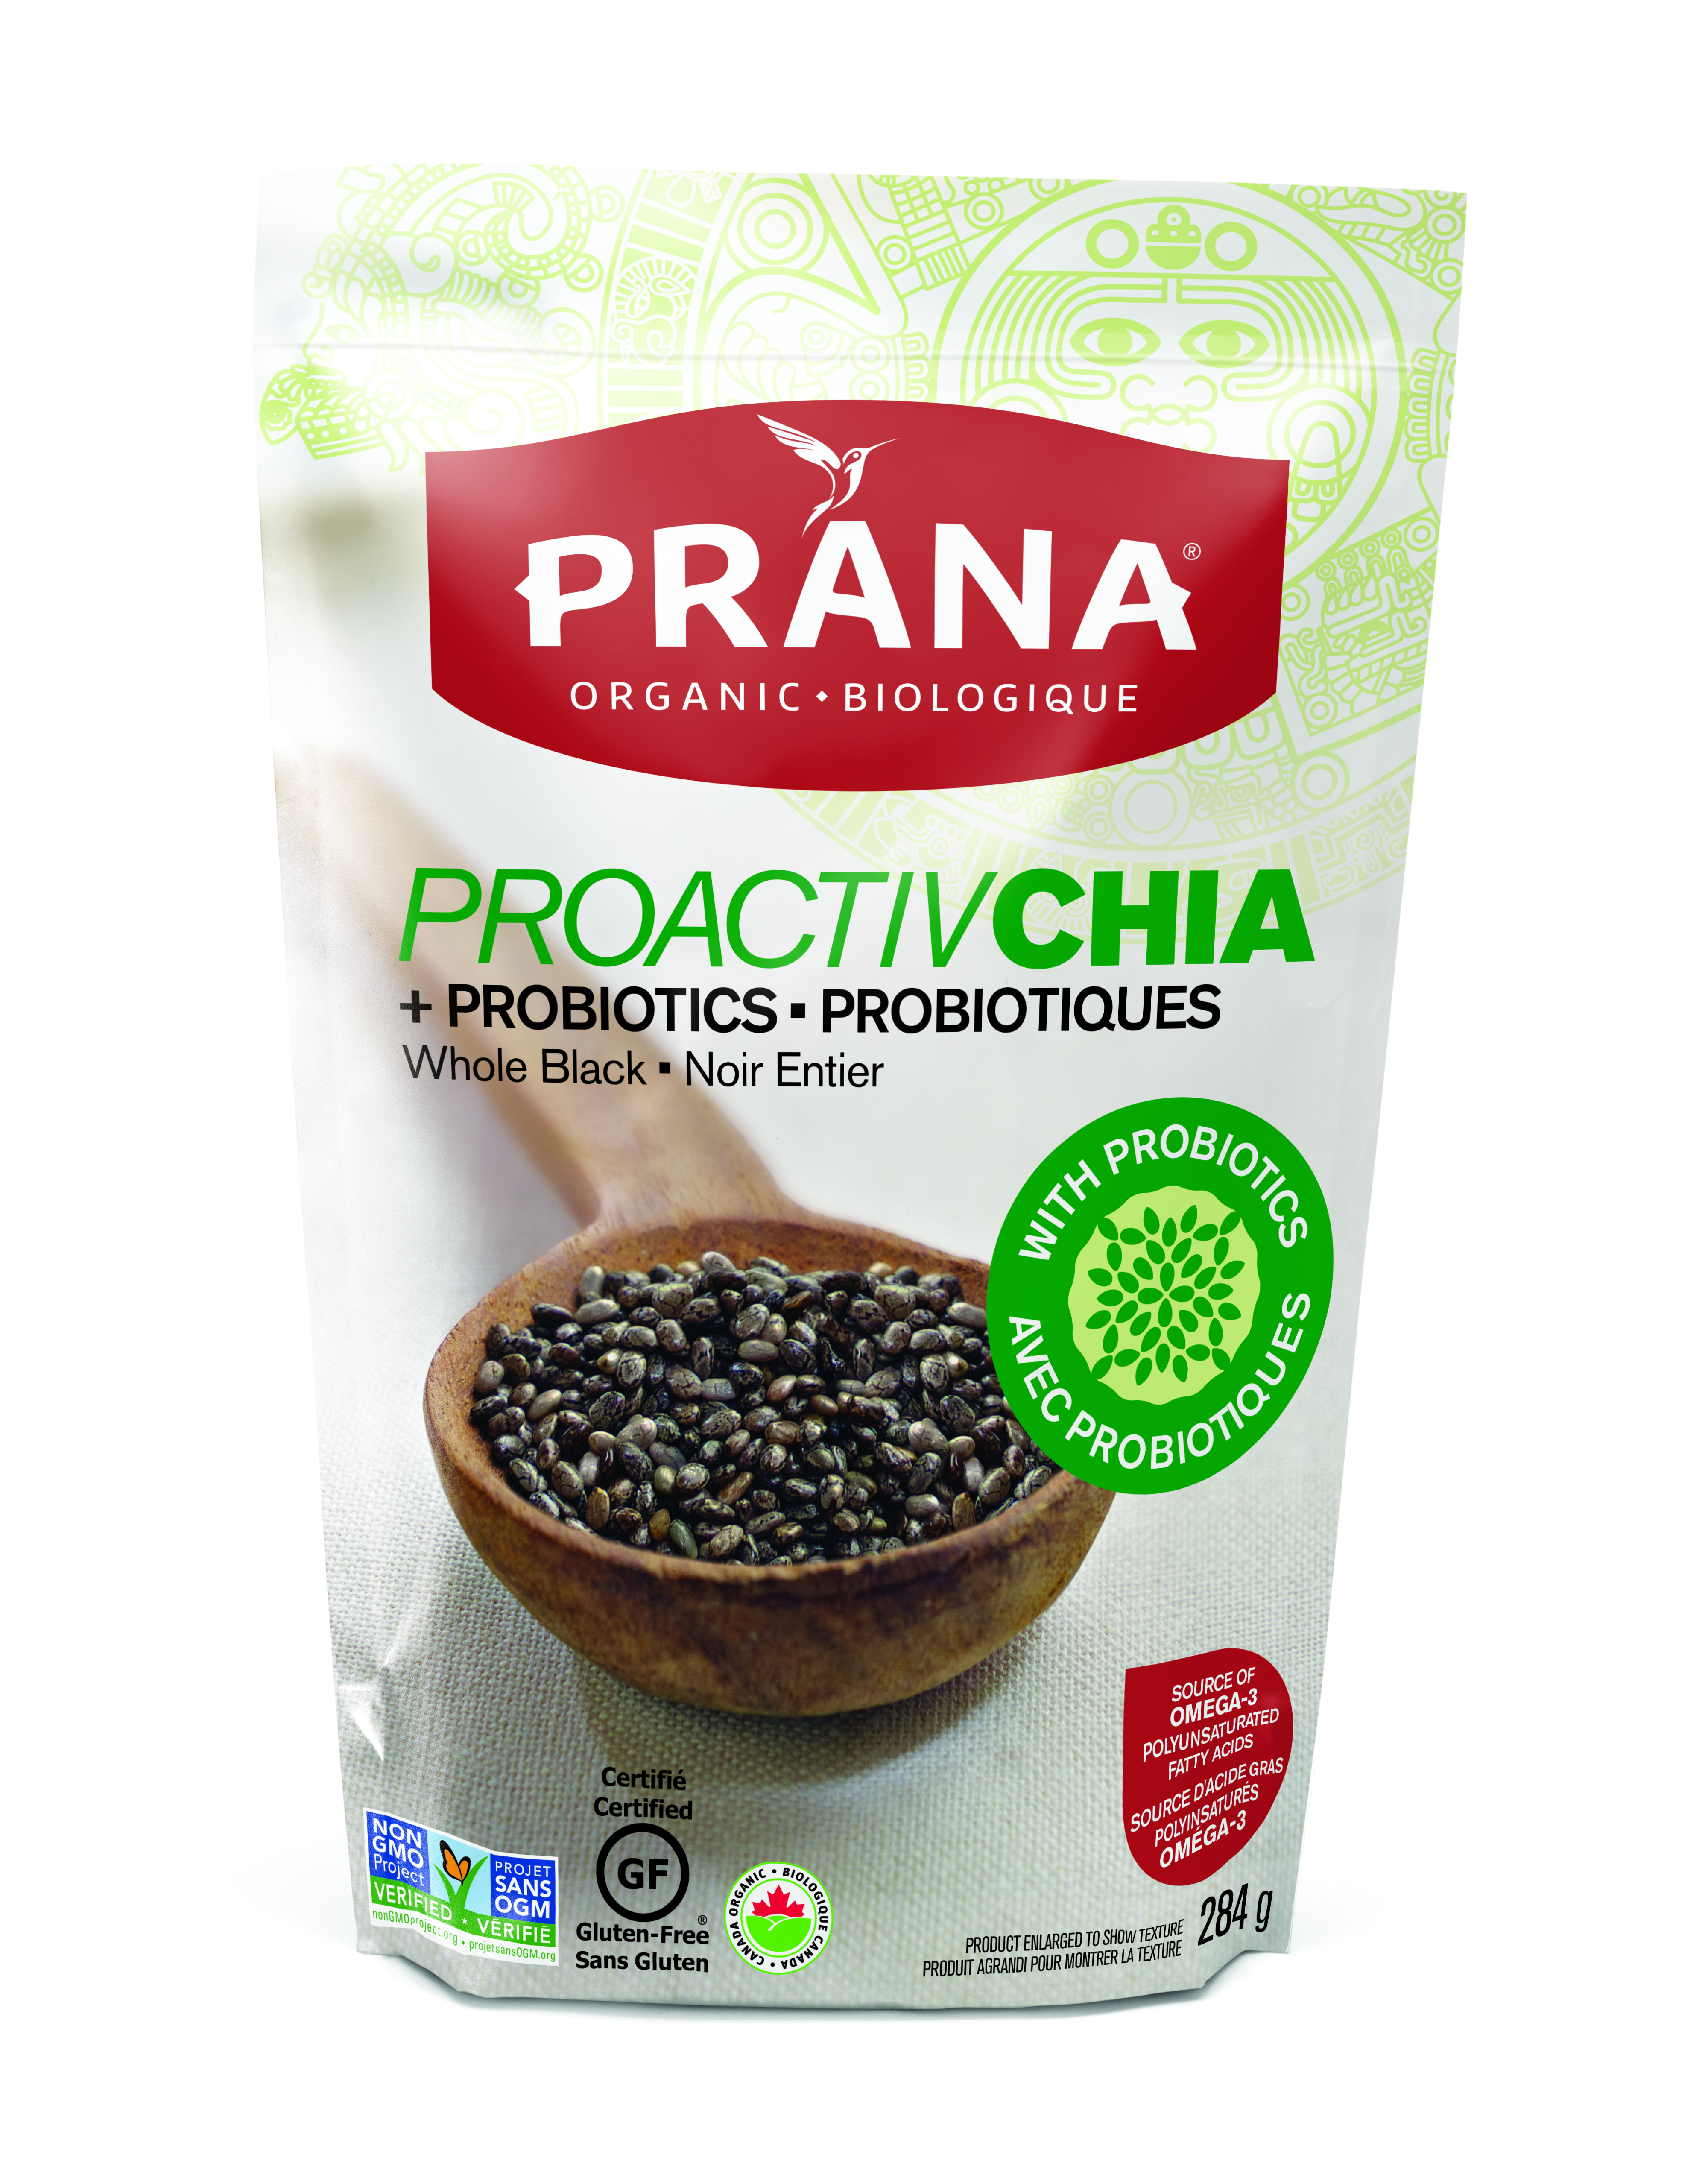 Prana ProactivCHIA image